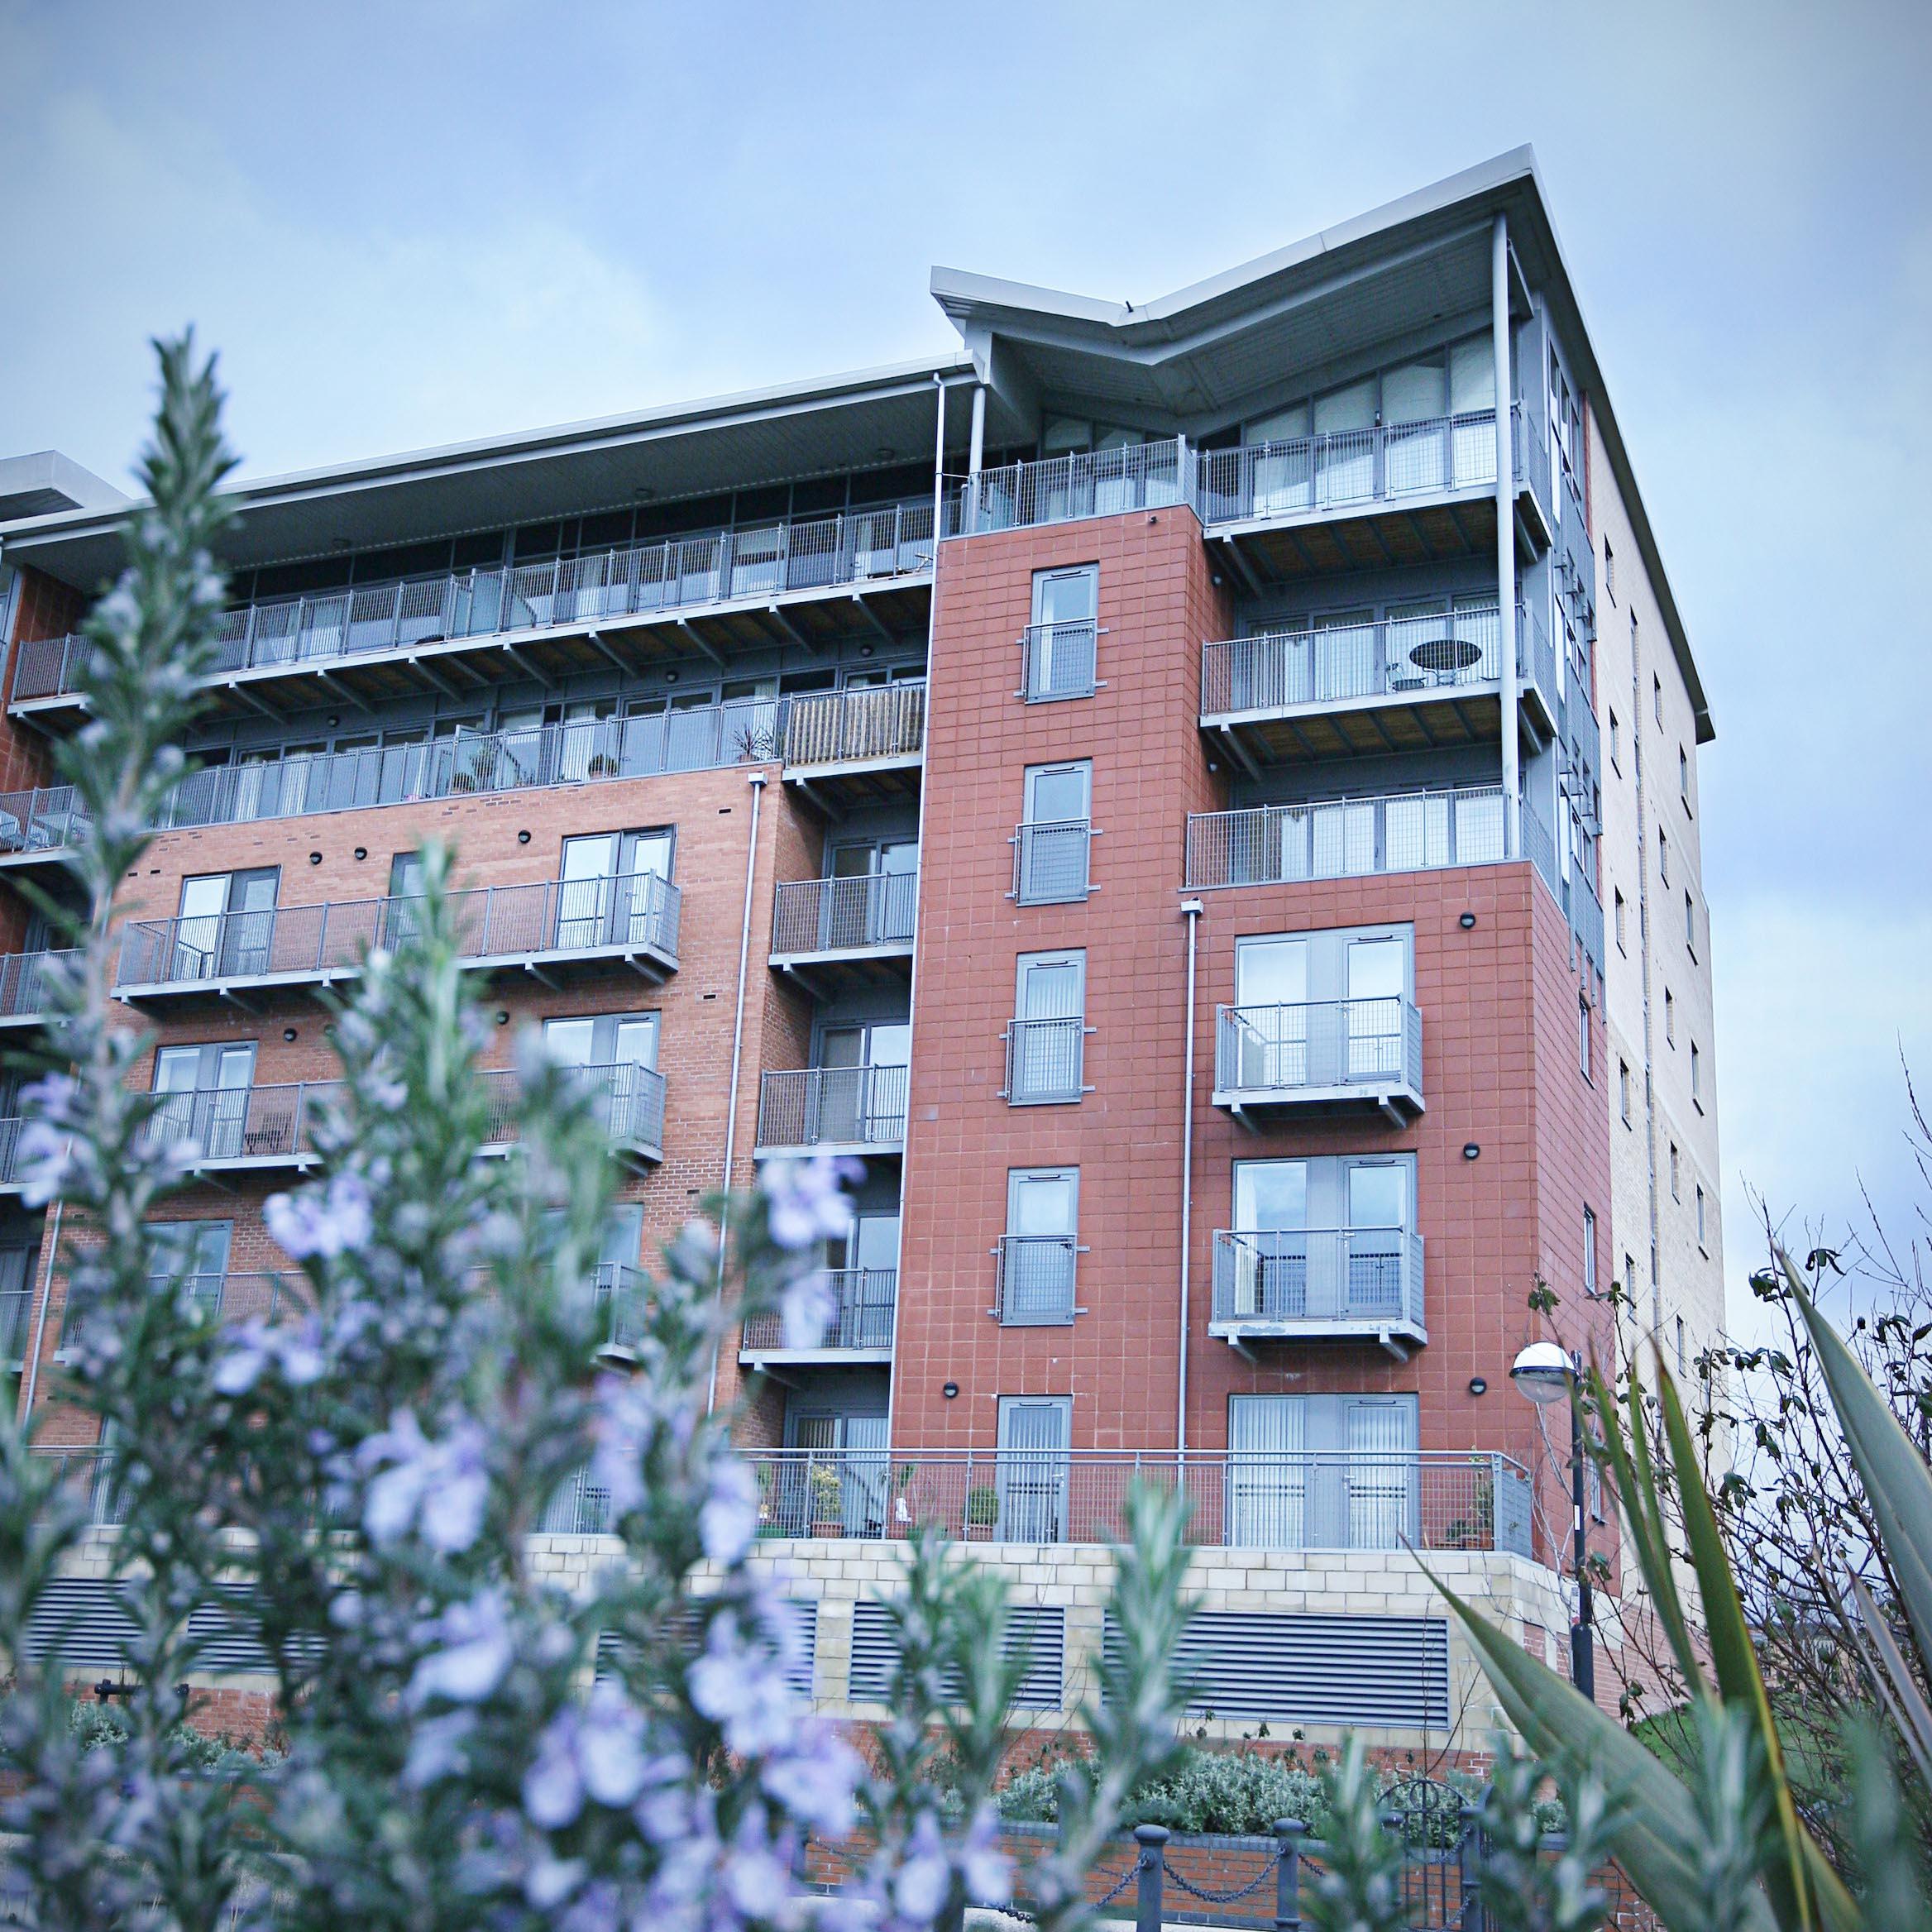 Lakeside Doncaster Yorkshire Niemen Architects